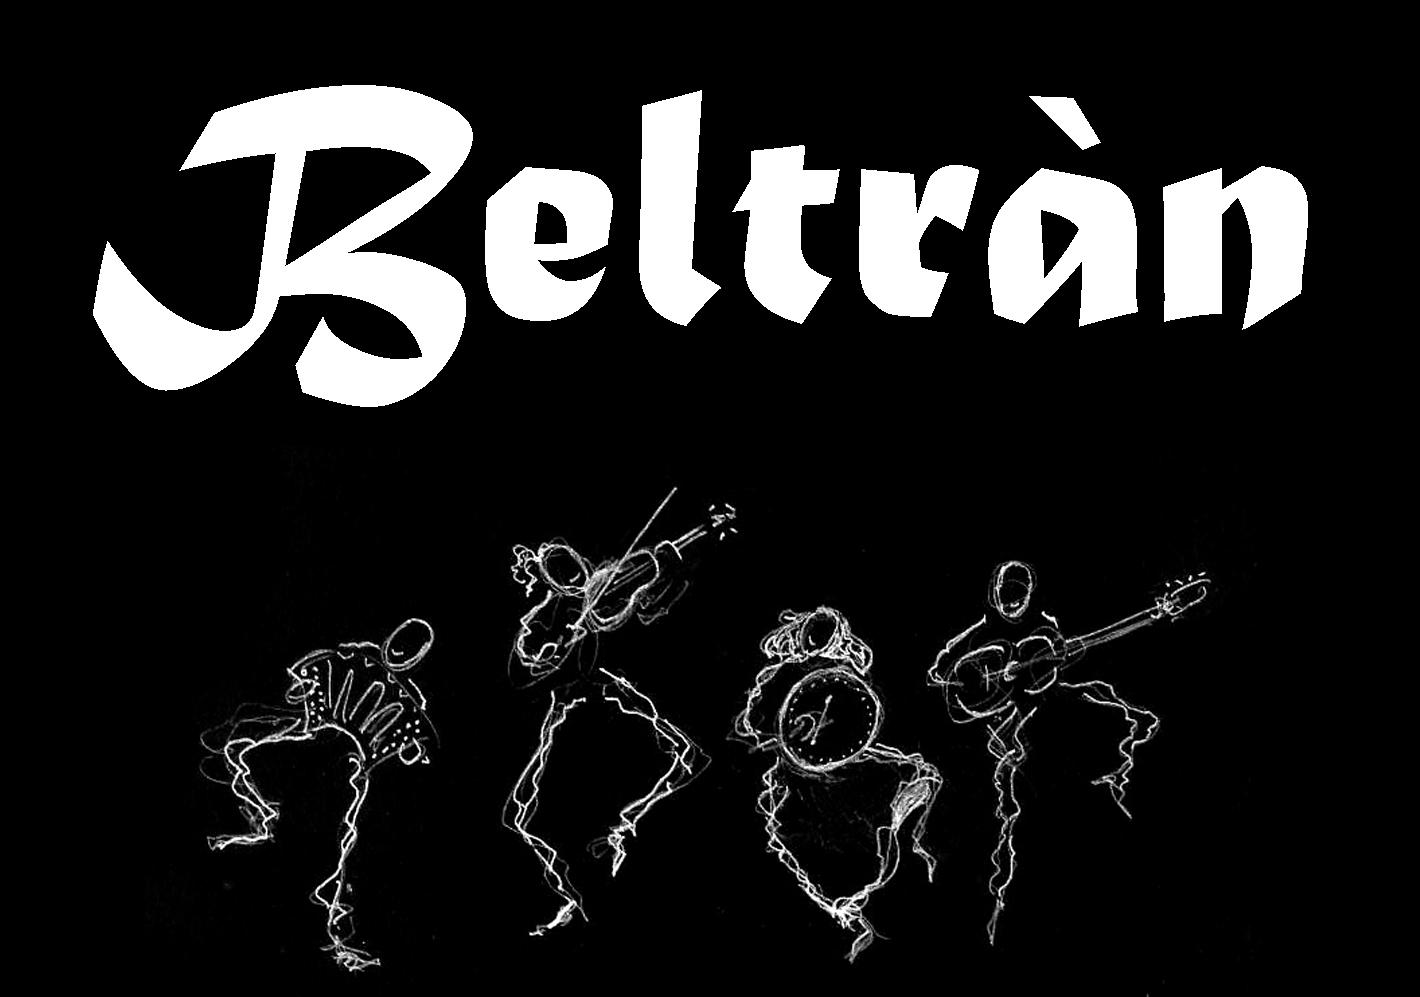 Beltràn-banière